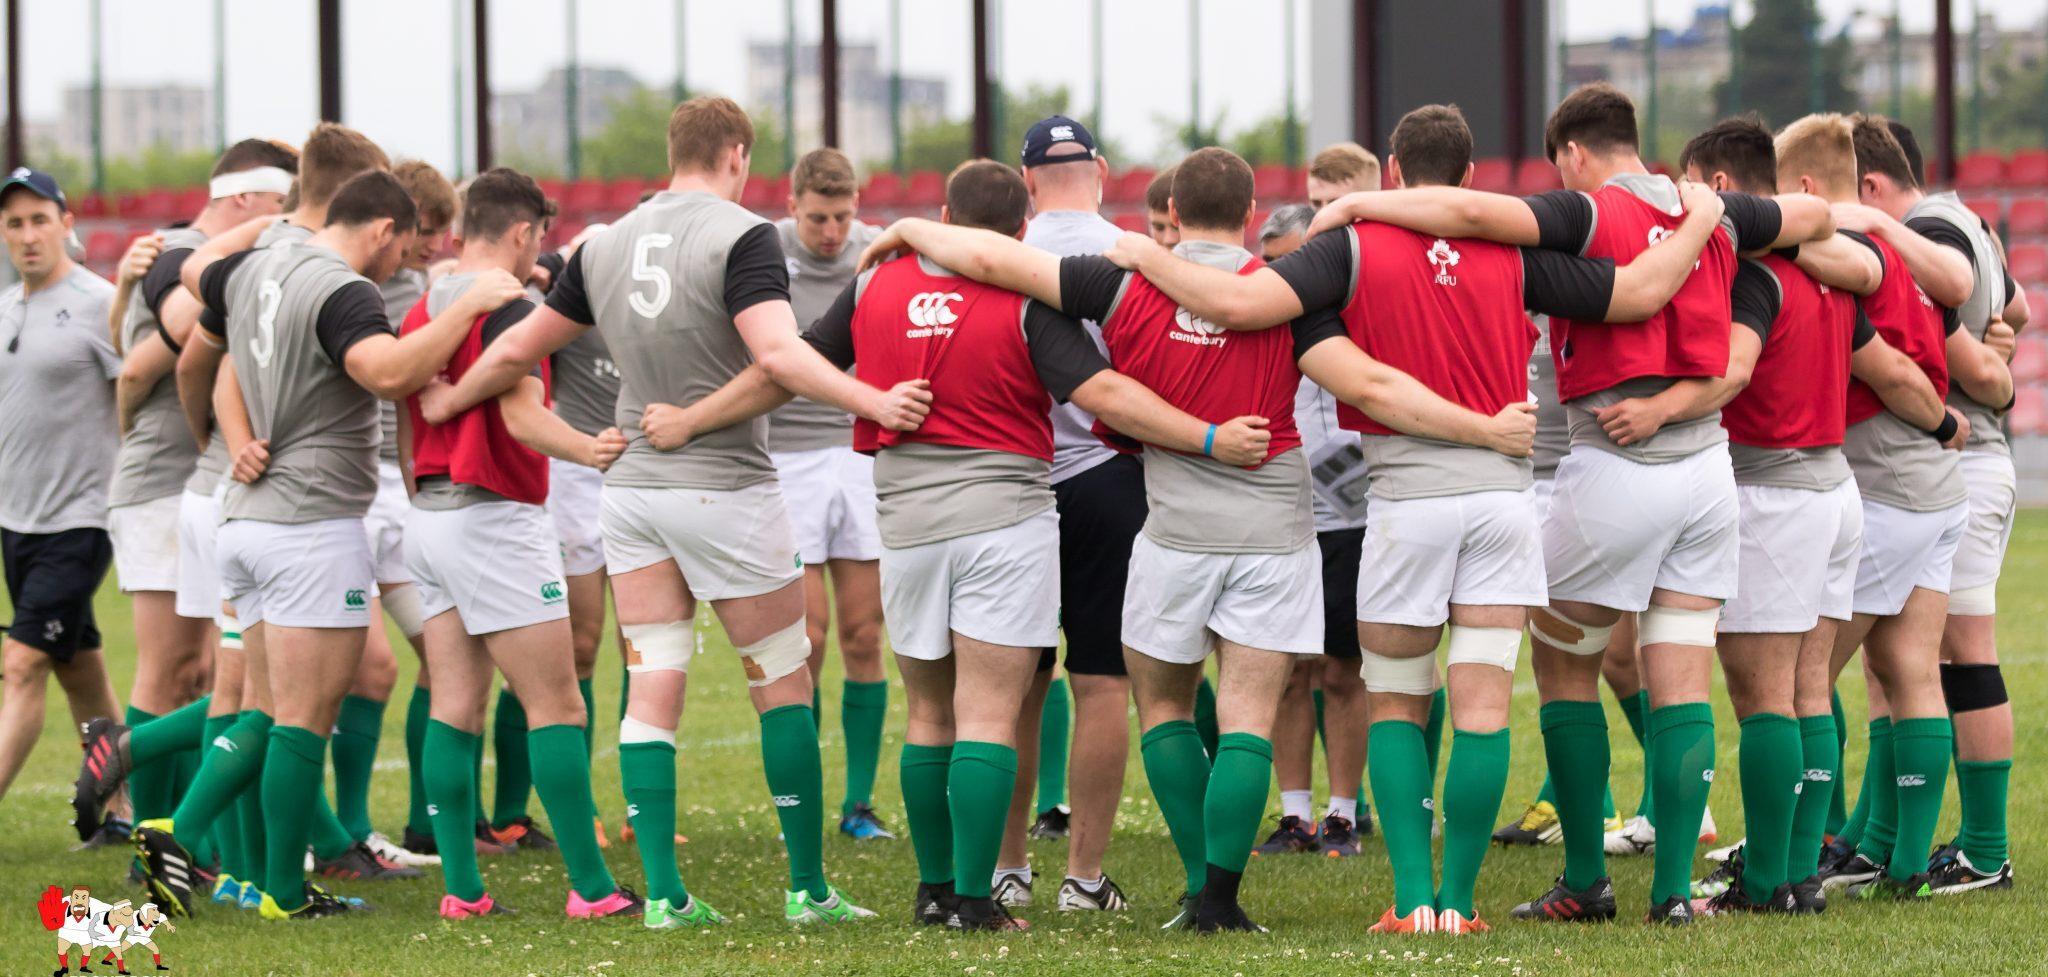 U20 Championship: Teams up for Ireland v New Zealand